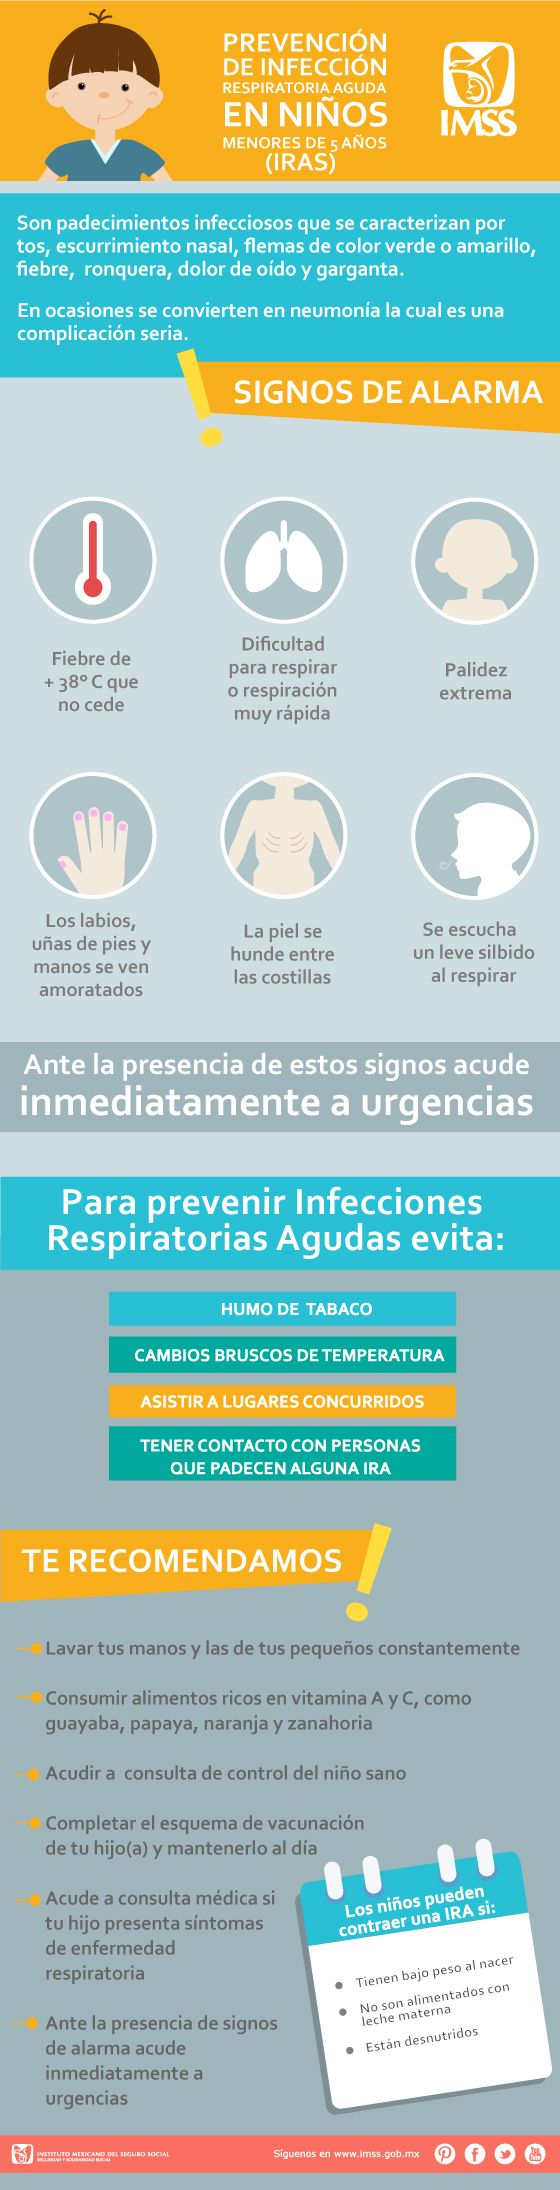 Prevención de Infecciones Respiratorias Agudas (IRAS) en Niños